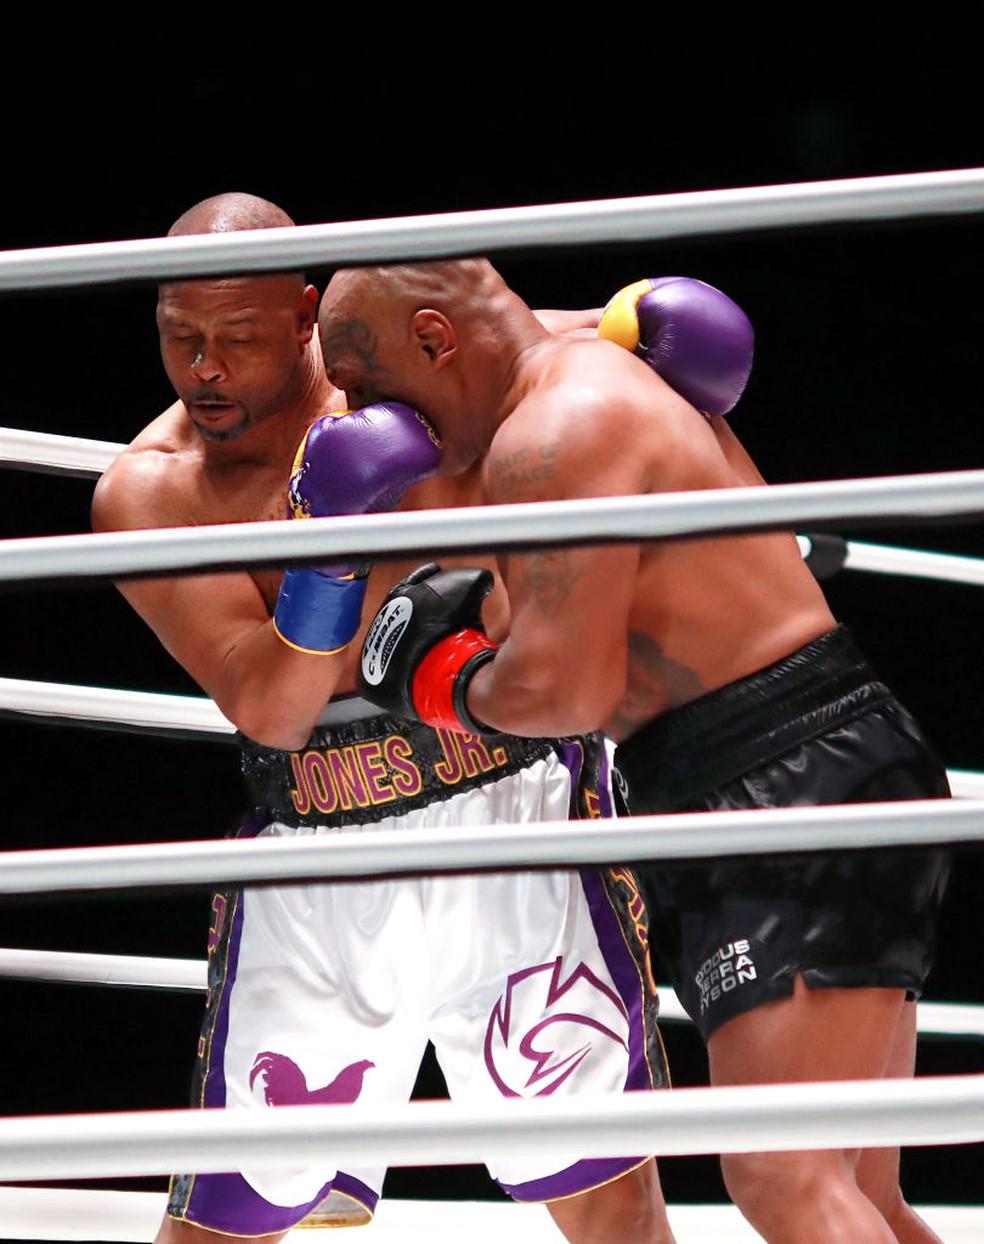 Roy Jones Jr. buscou sempre amarrar a luta — Foto: Joe Scarnici/Getty Images for Triller